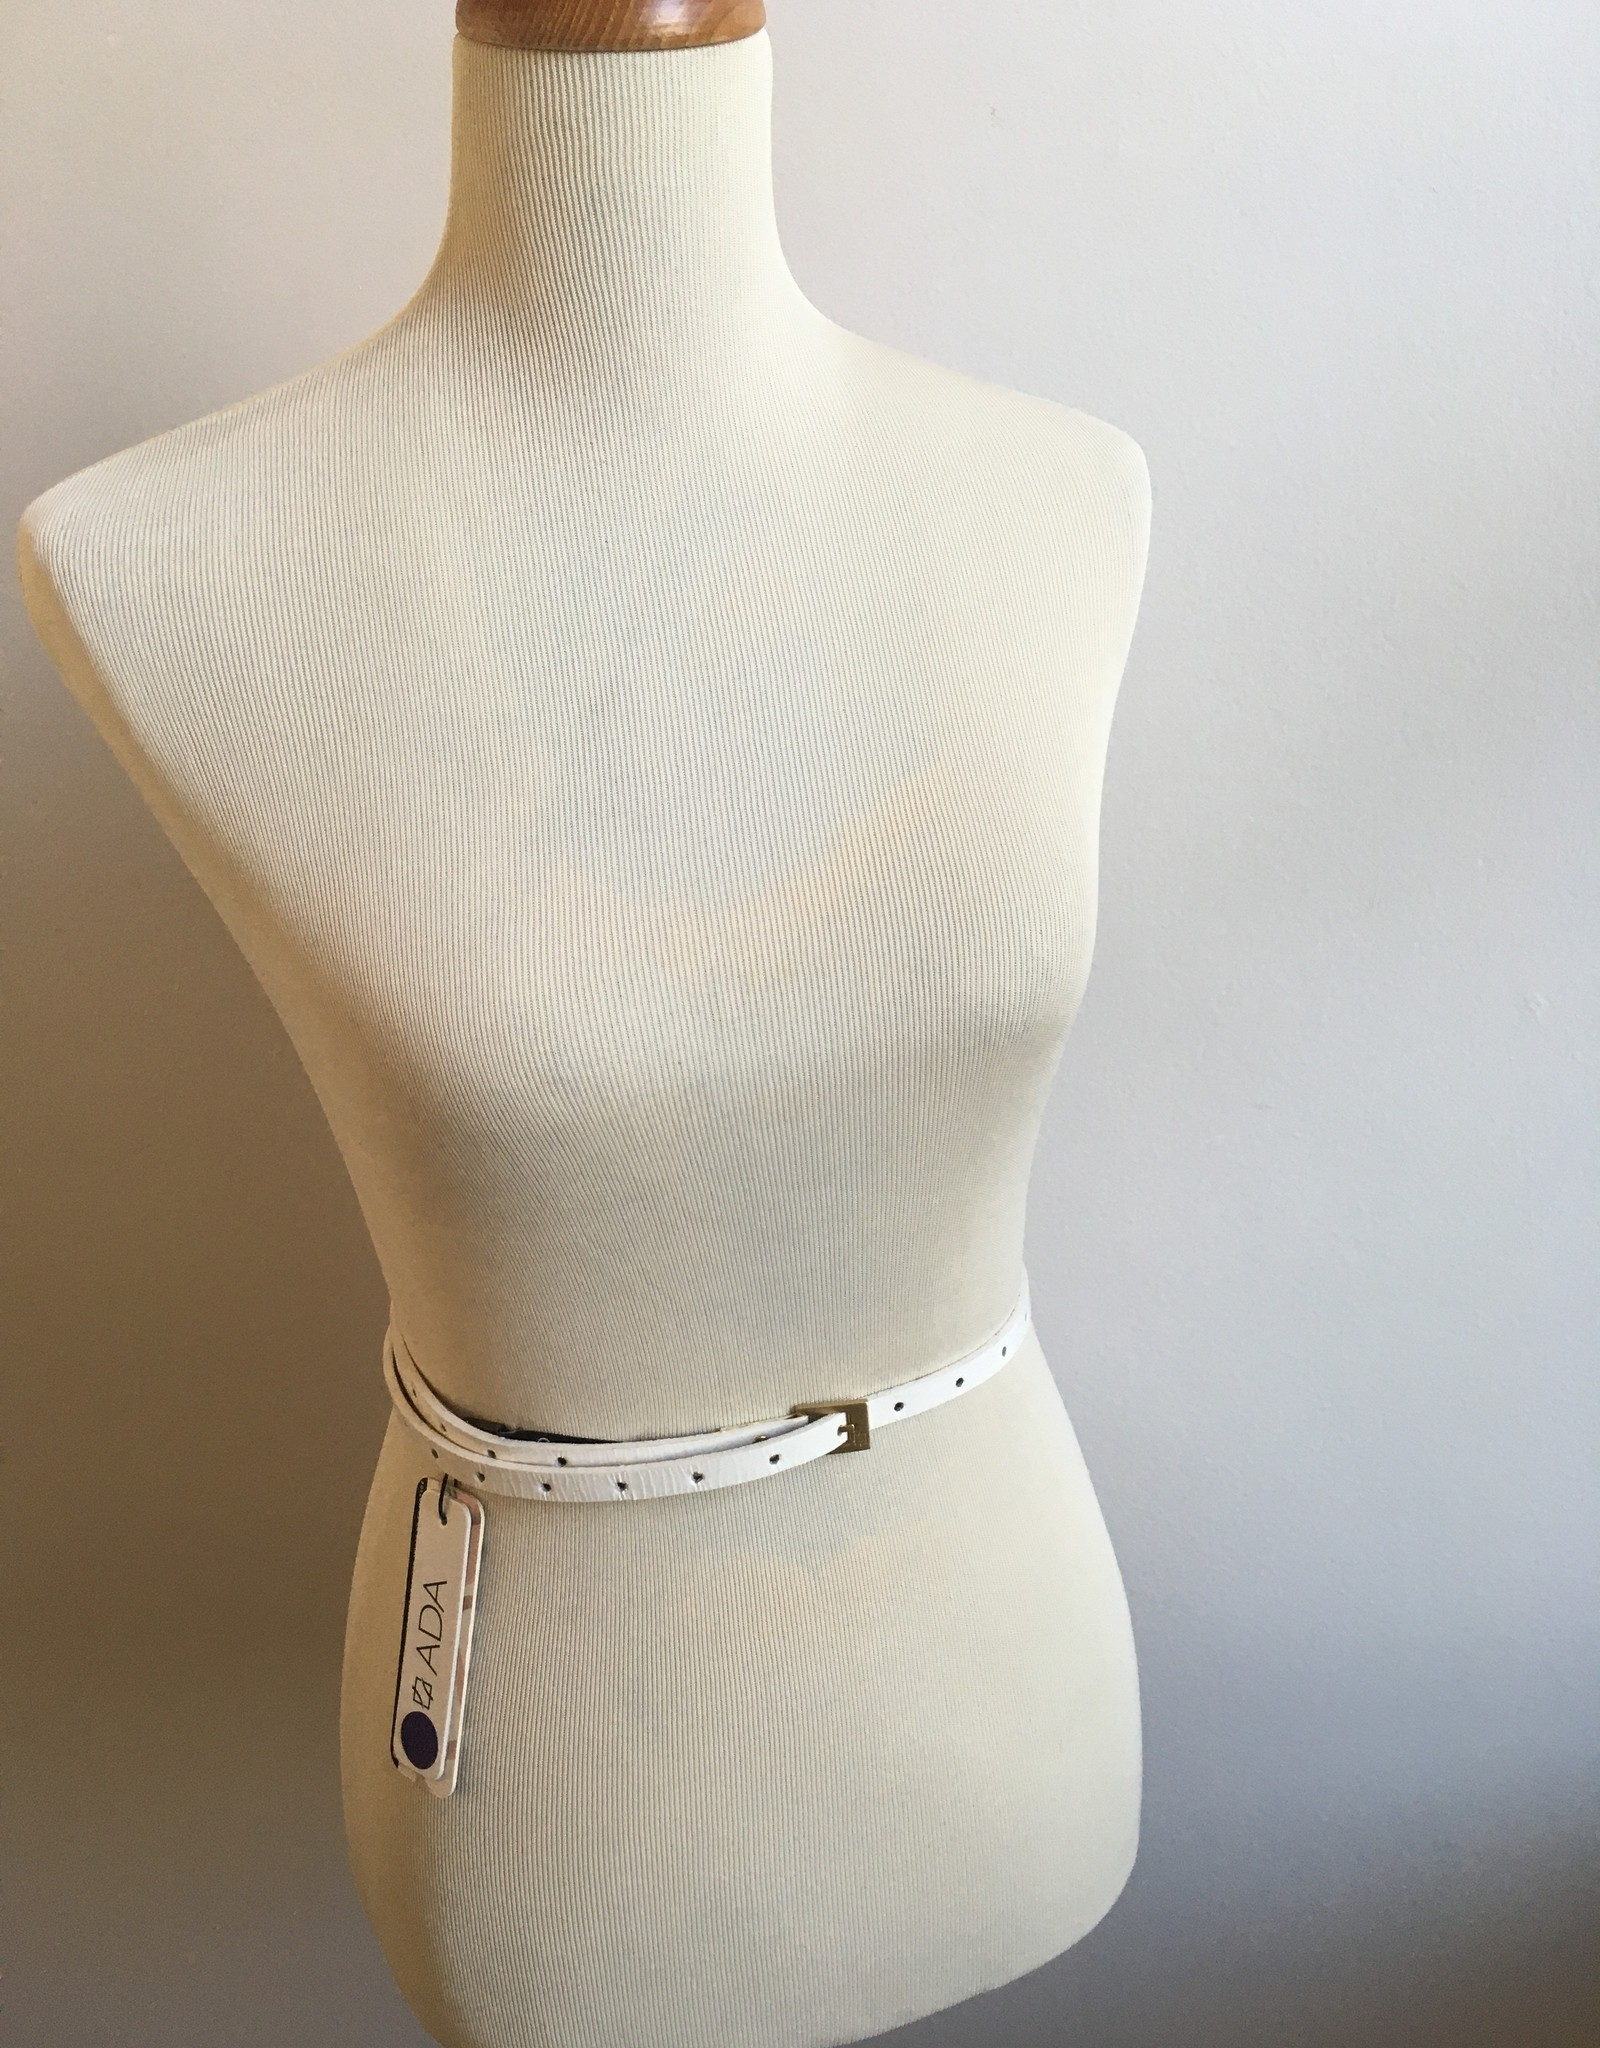 Claire Patent White Belt